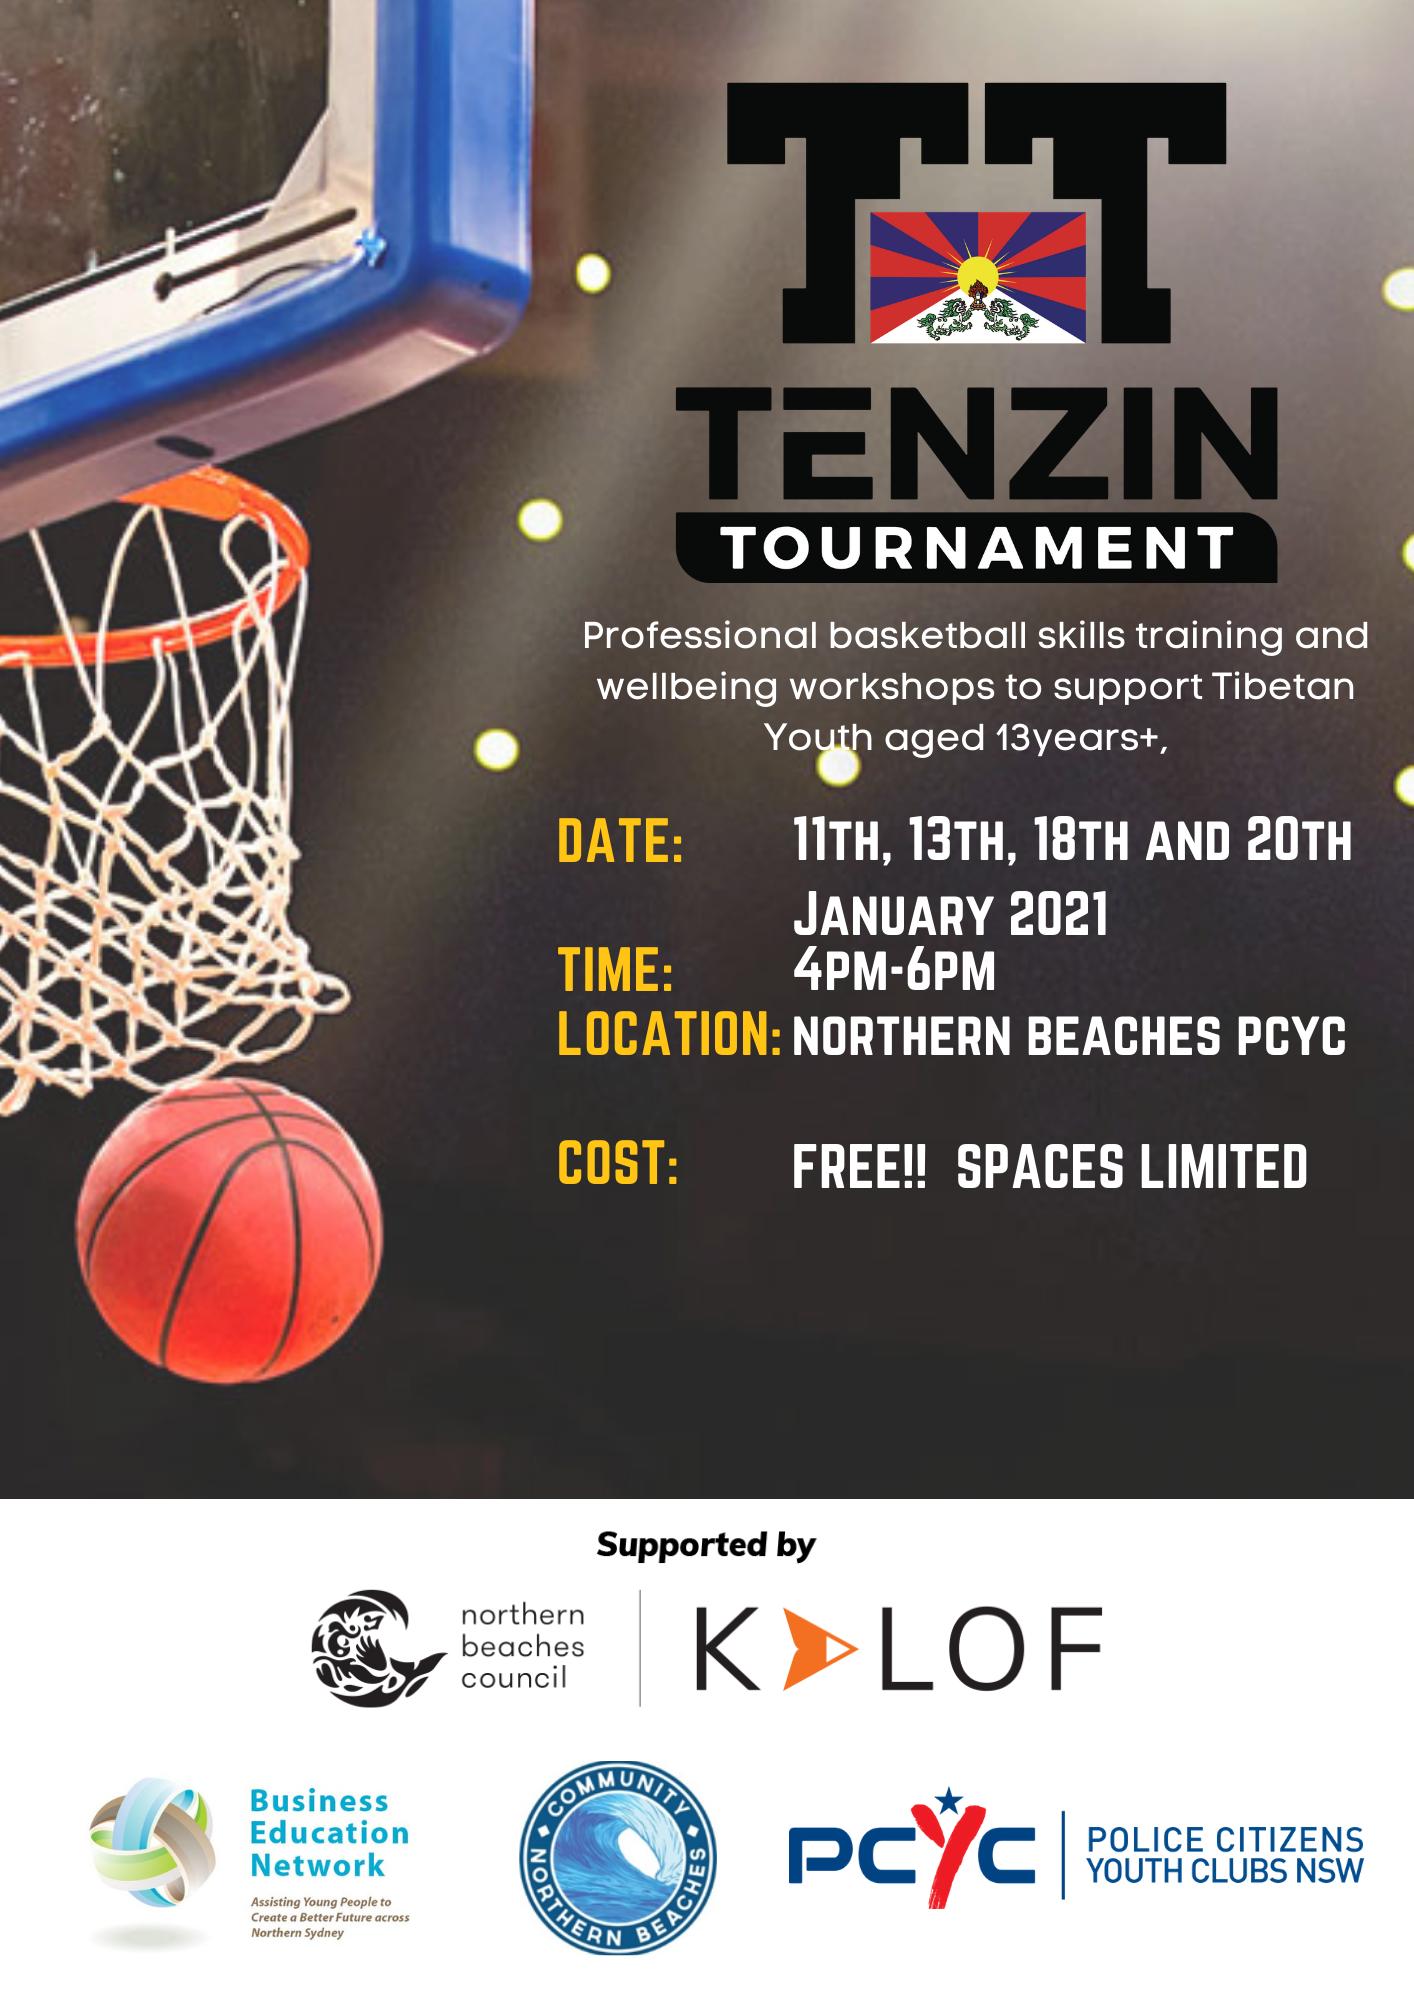 A4 Tenzin Tournament